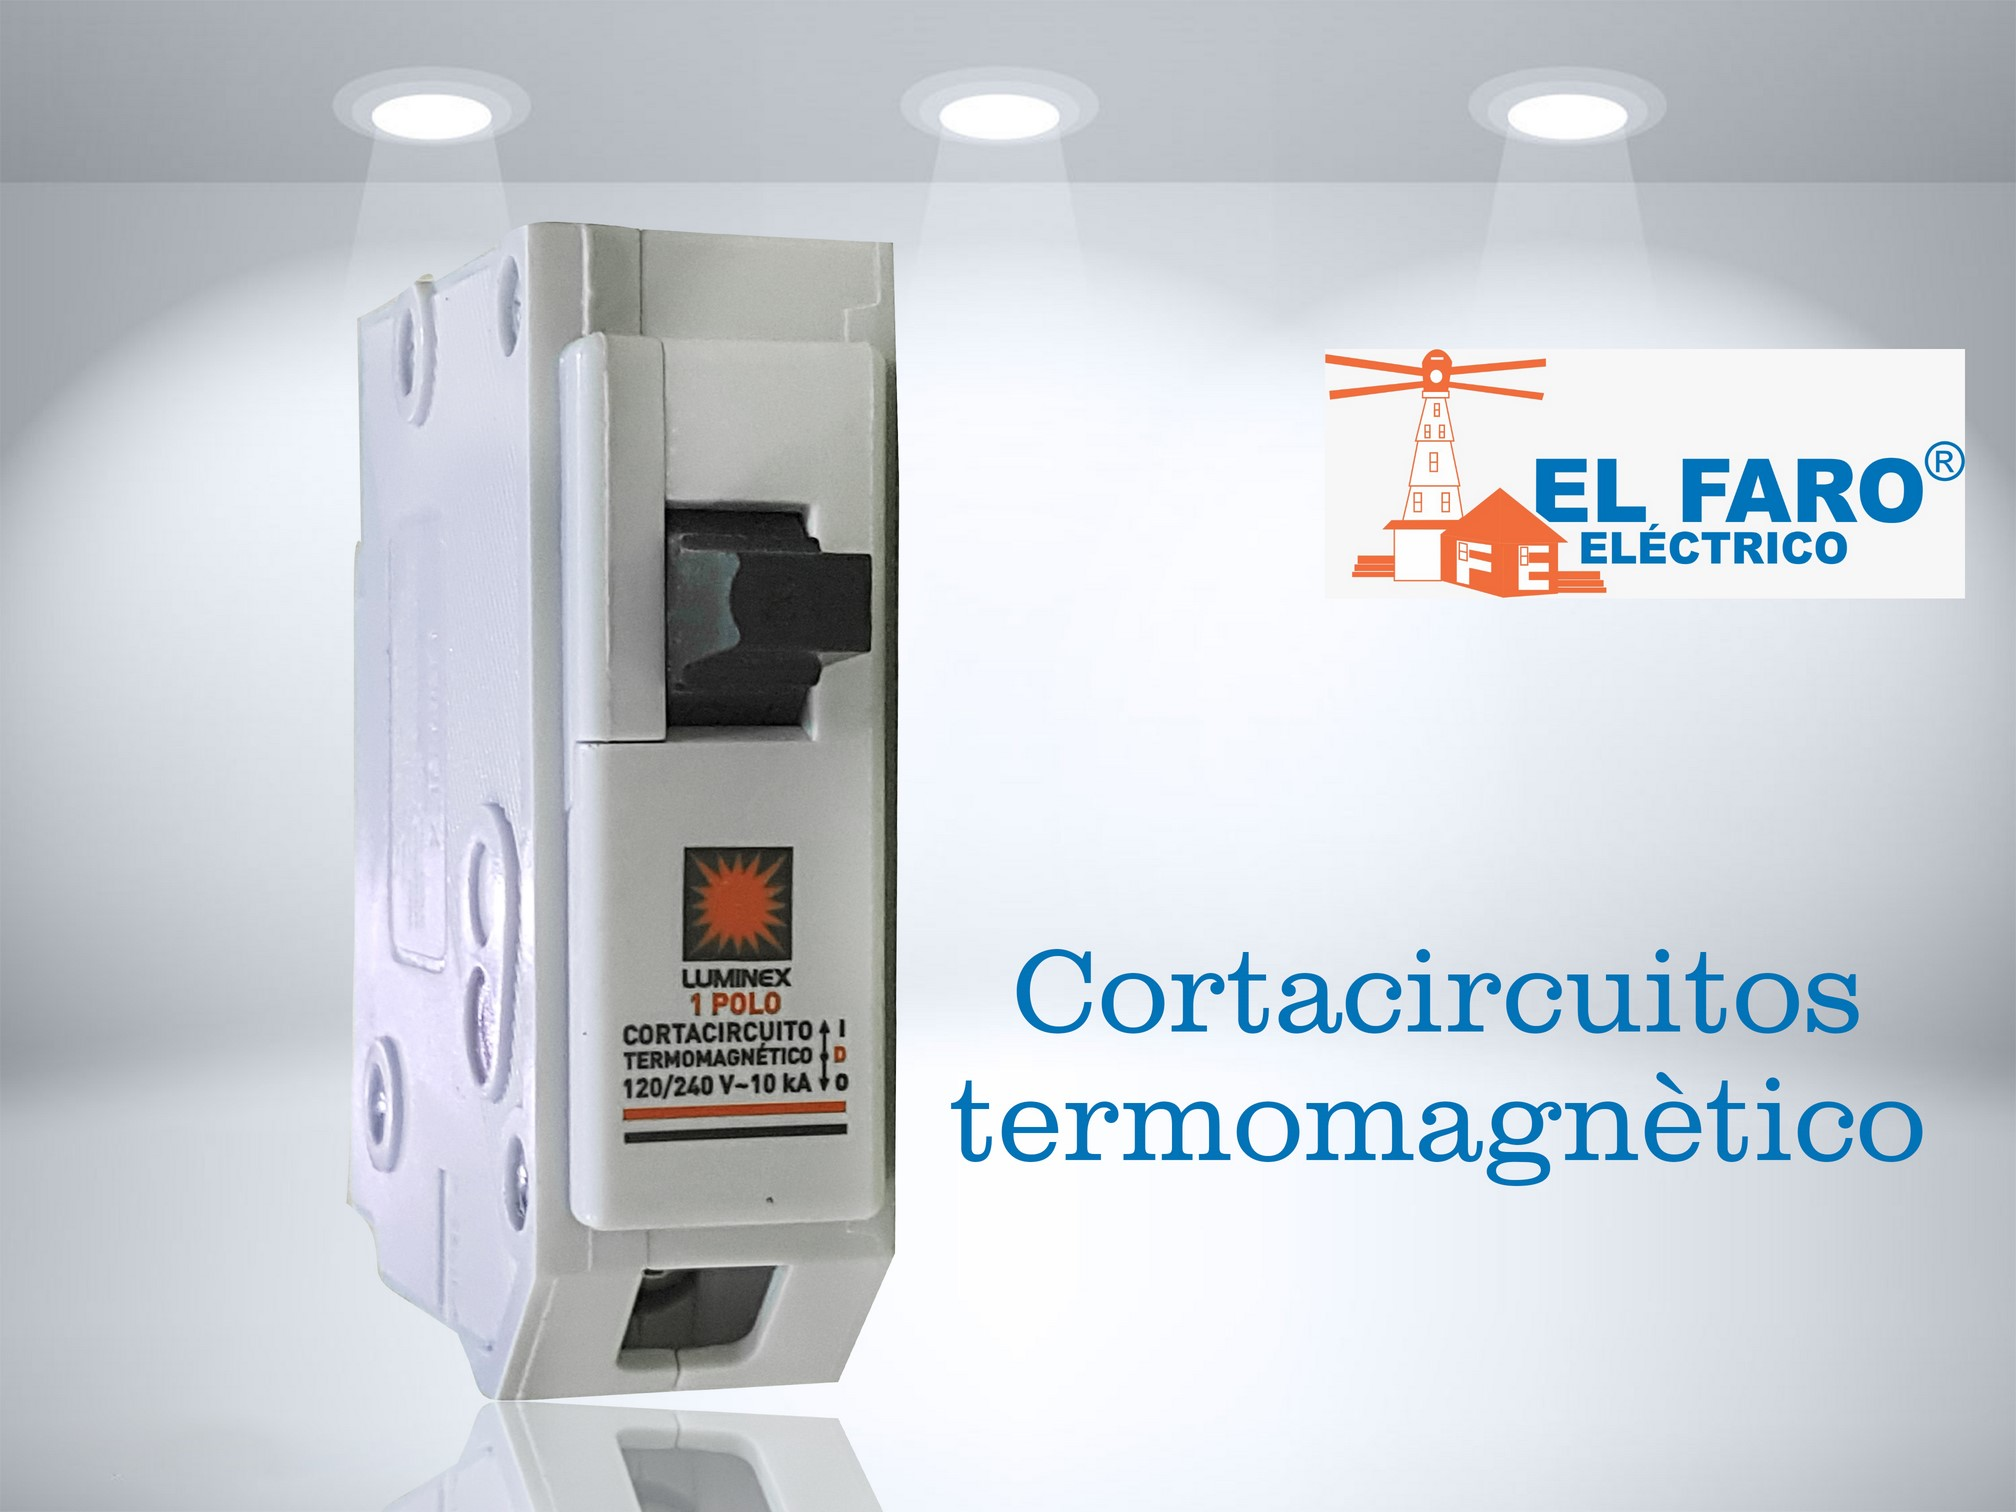 Cortacircuitos electromagnético